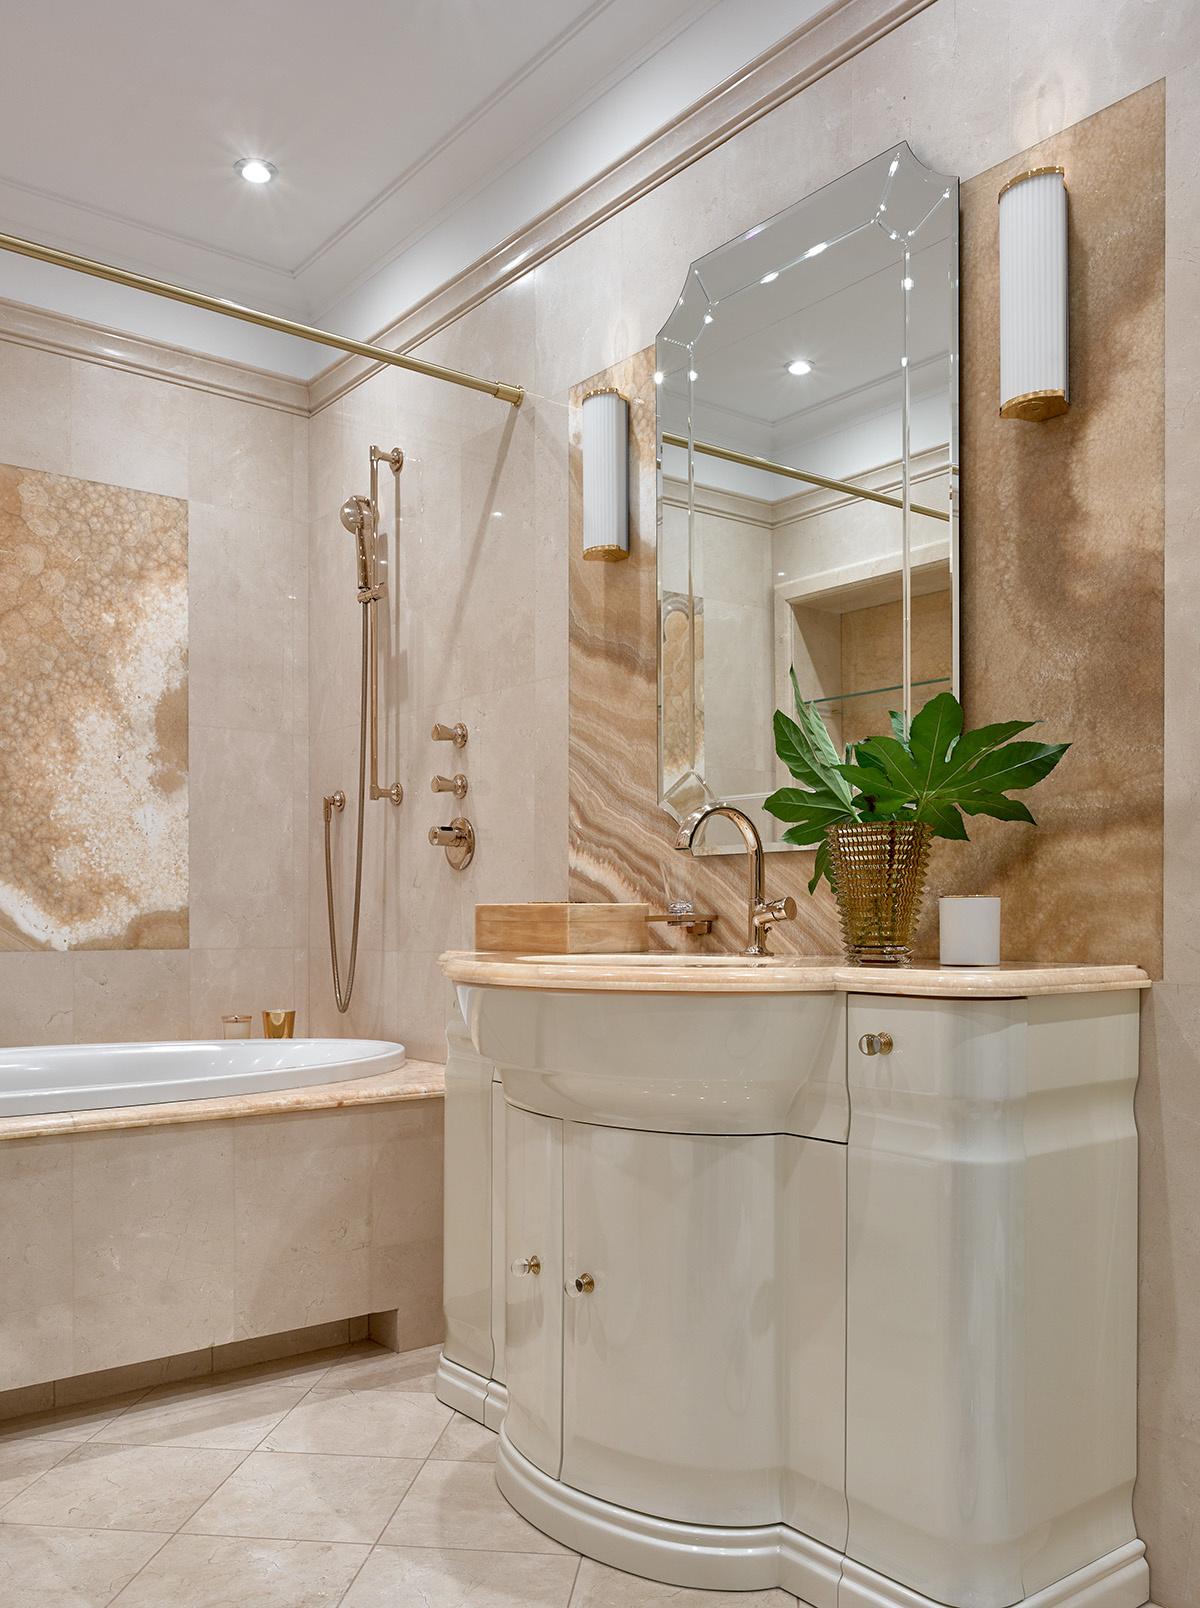 Розовая пудра: 15+ ванных комнат в нежной гамме (галерея 1, фото 3)